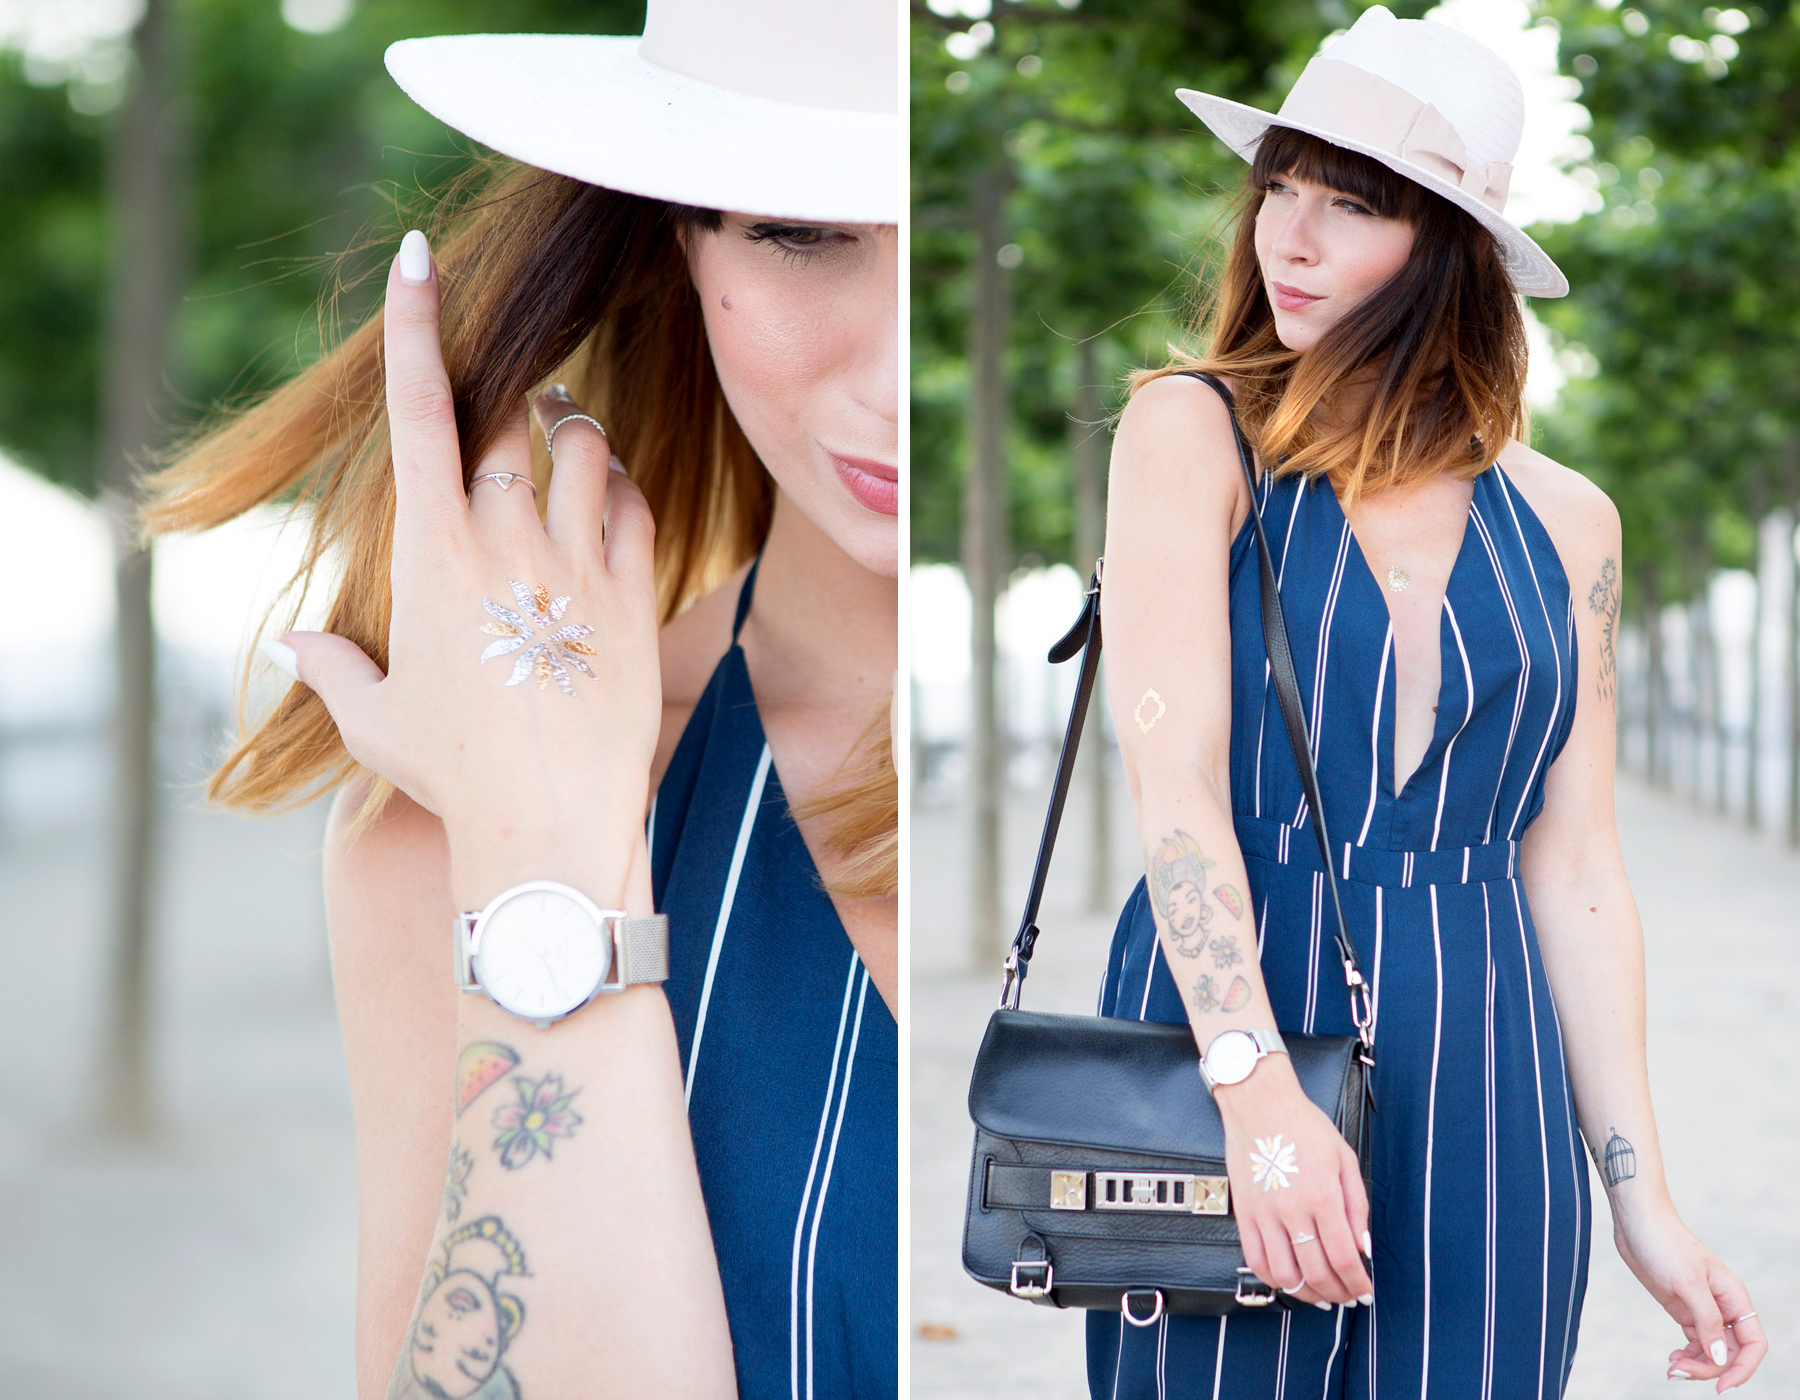 forever 21 jumpsuit overall streifen blue hat summer ombre cats & dogs ricarda schernus blogger berlin 2